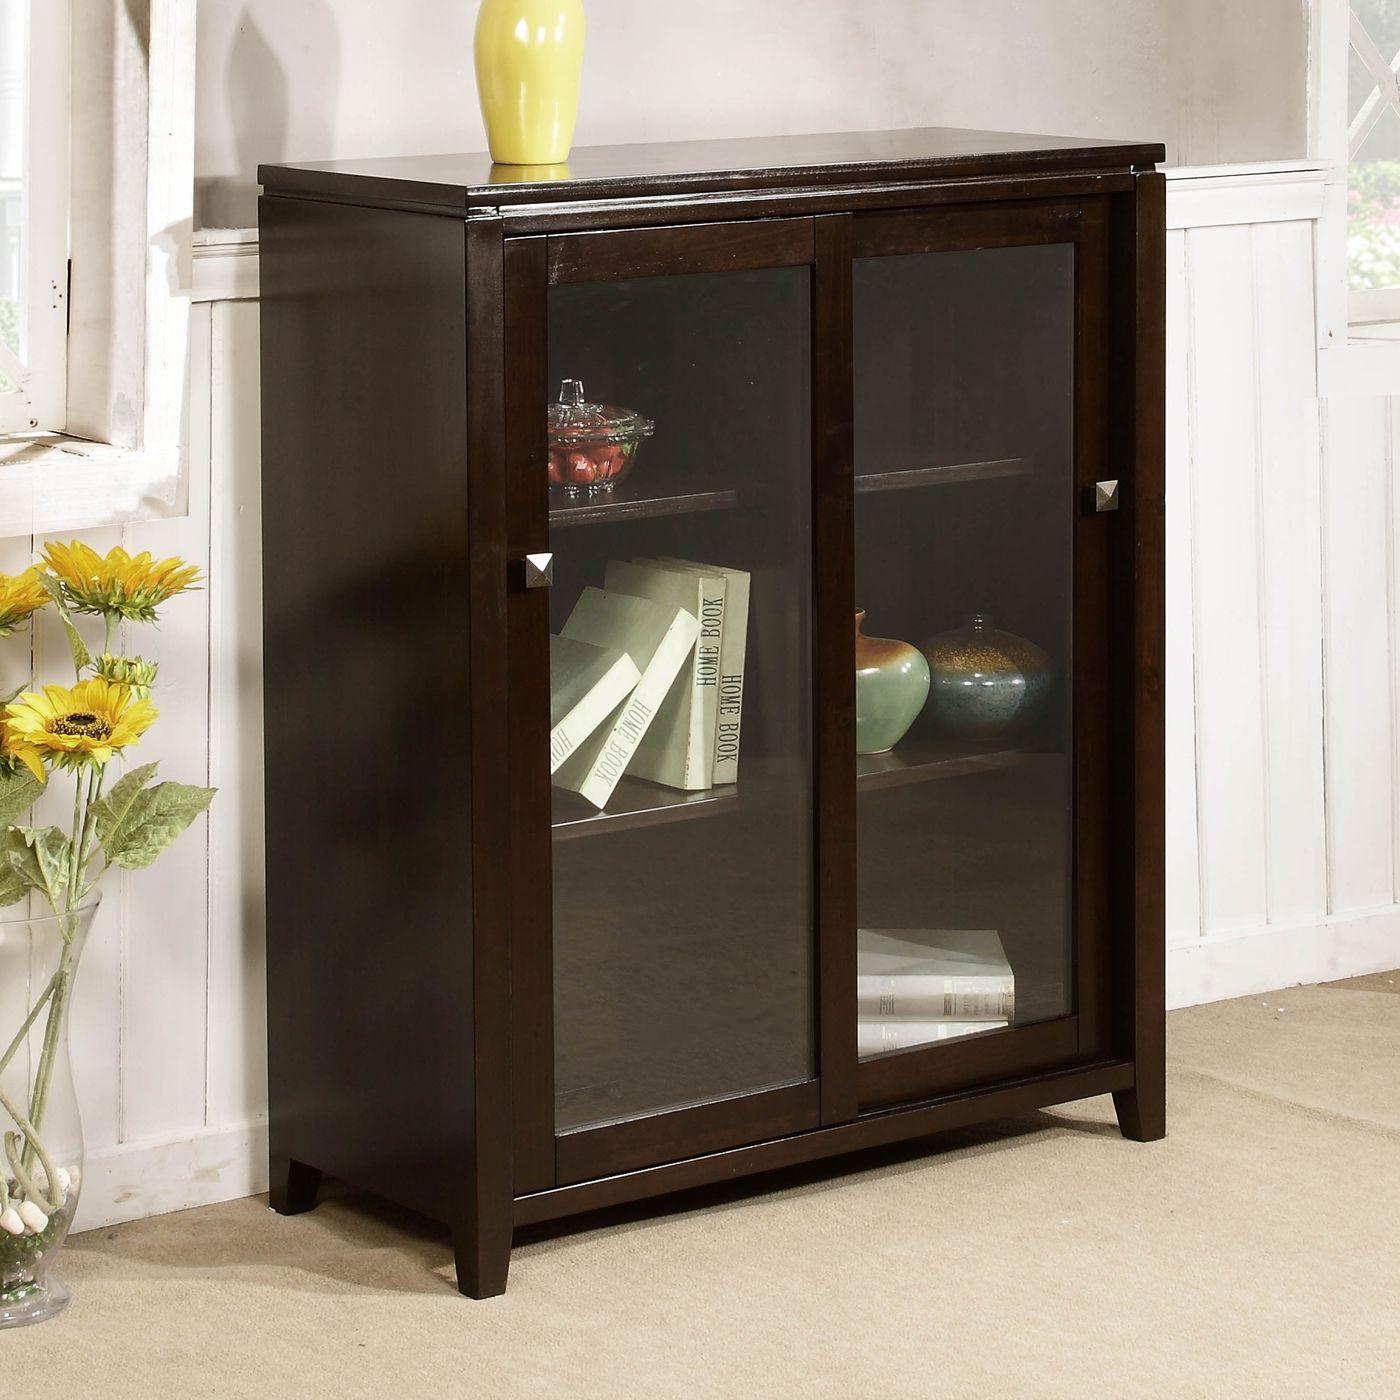 35999 the cosmopolitan medium storage unit makes a